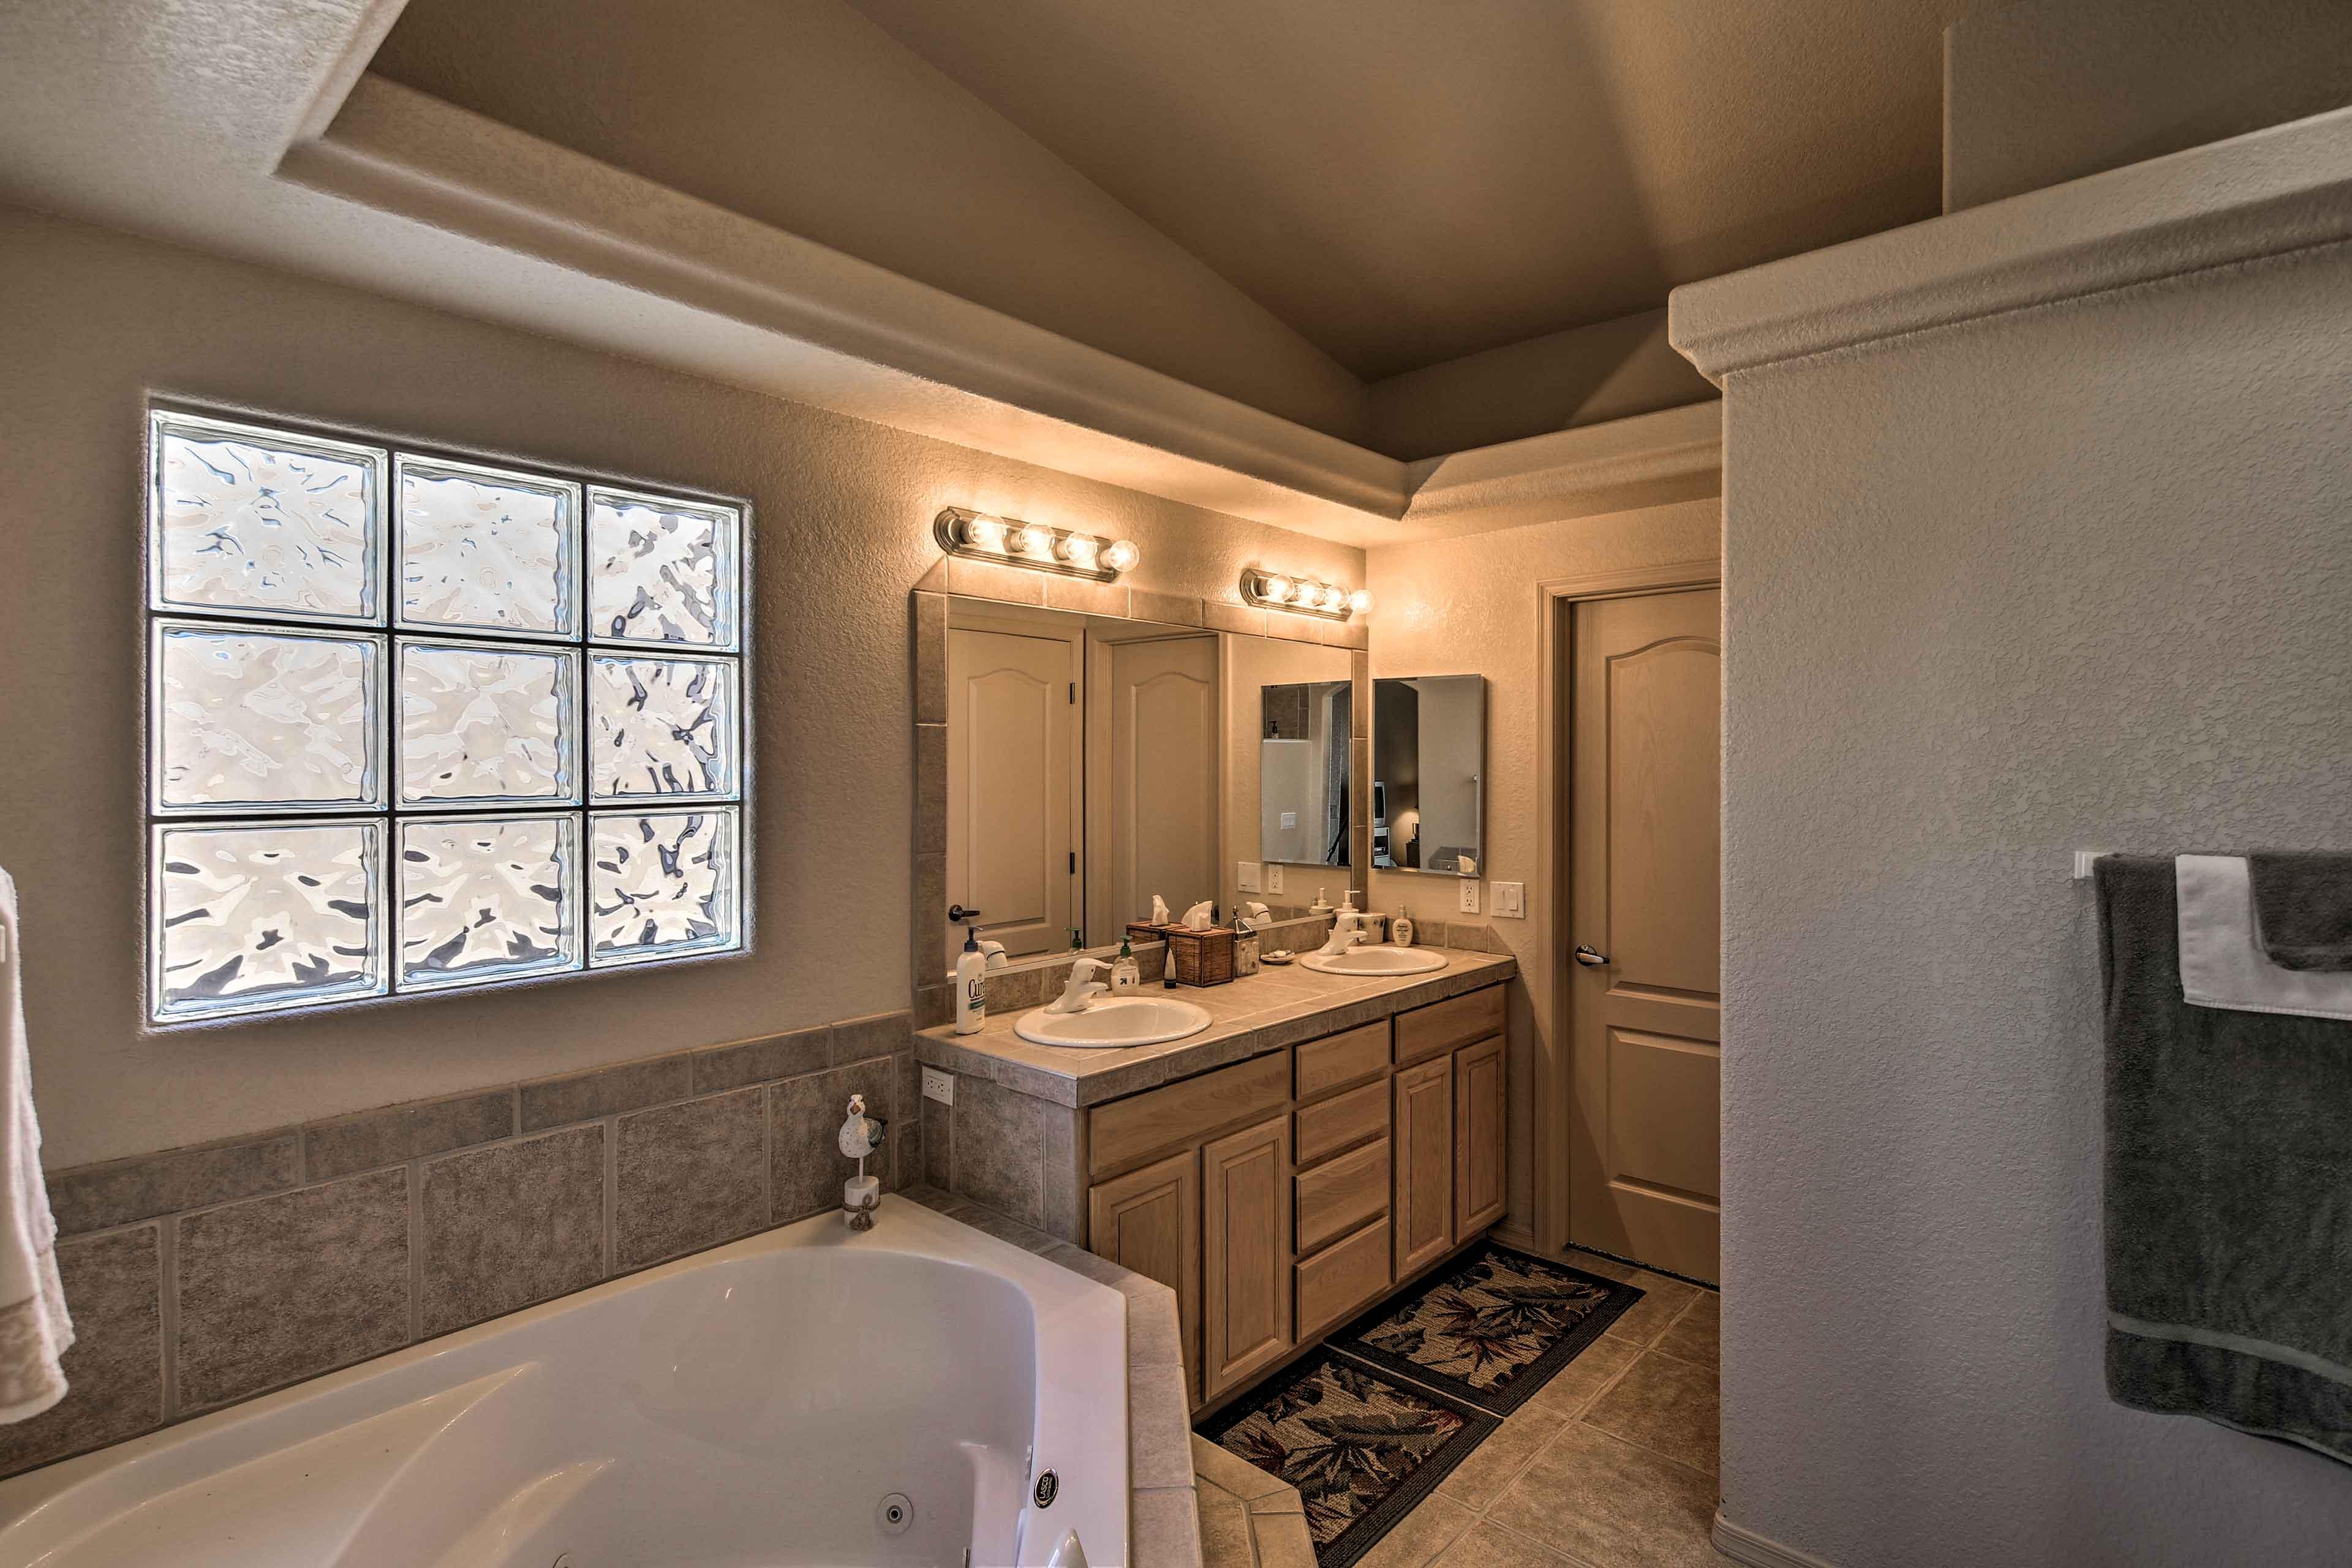 The master en-suite bathroom boasts a large Jacuzzi tub.